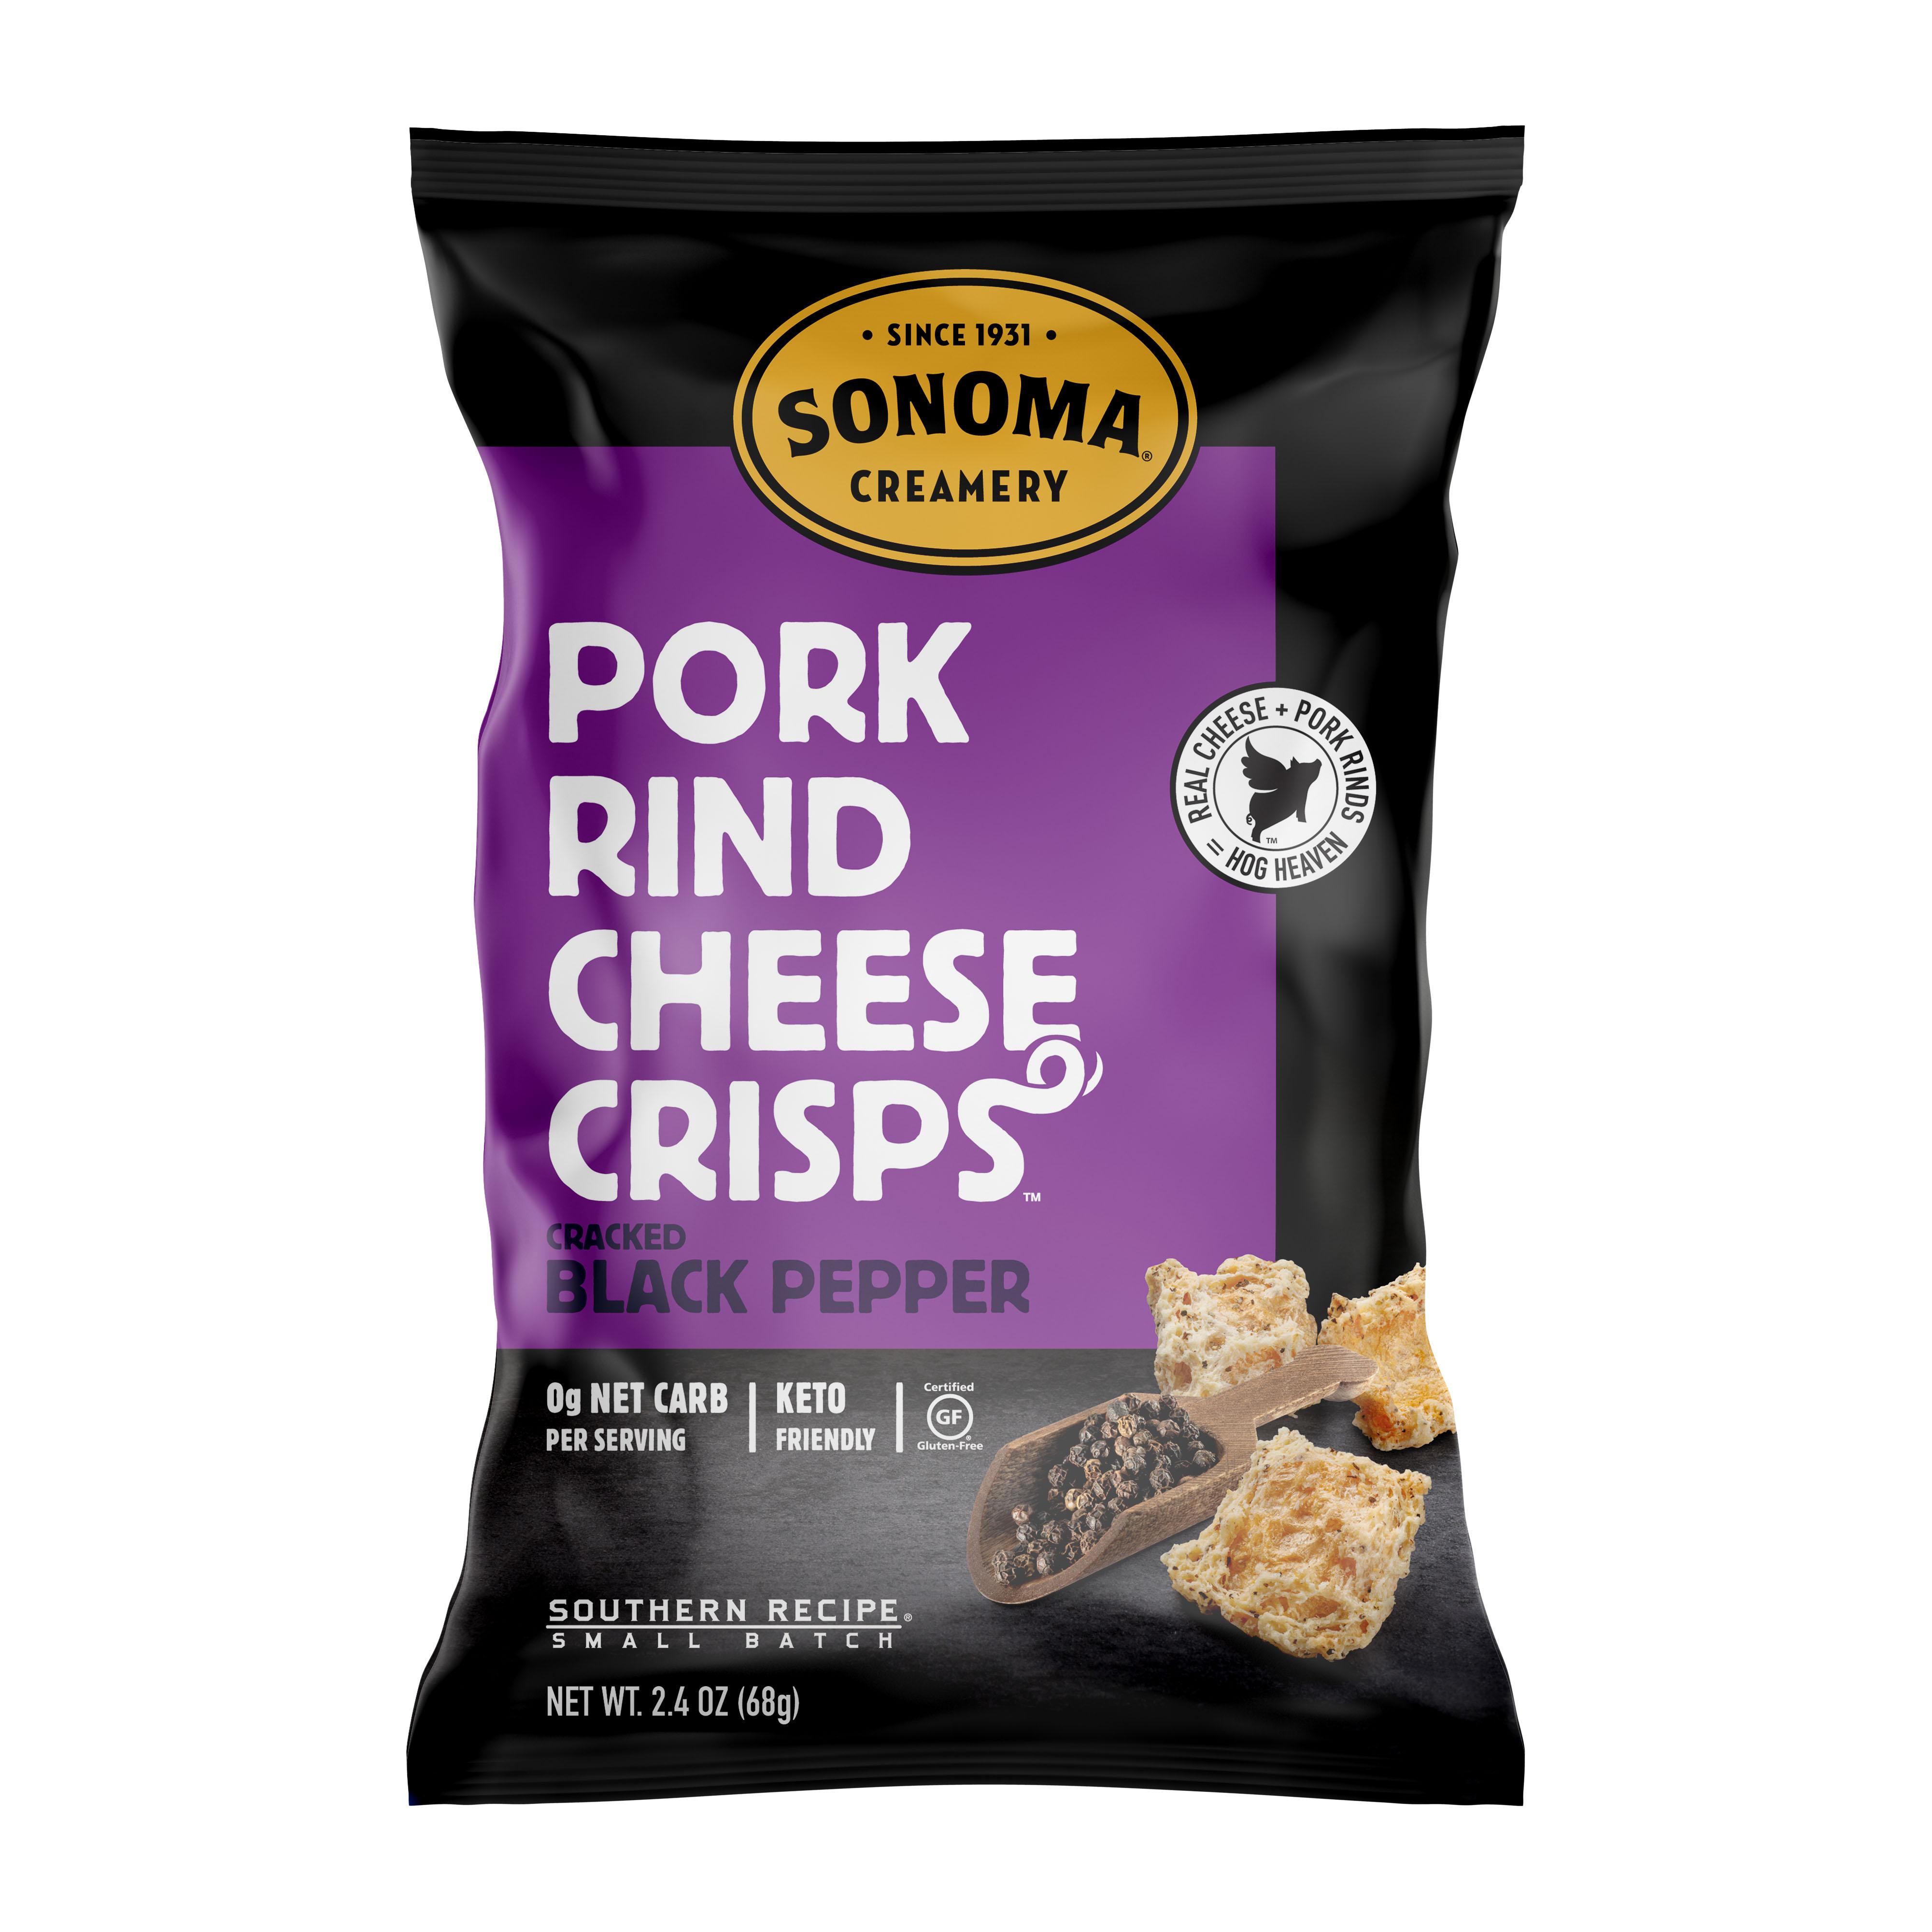 Pork Rind Cheese Crisps/Black Pepper